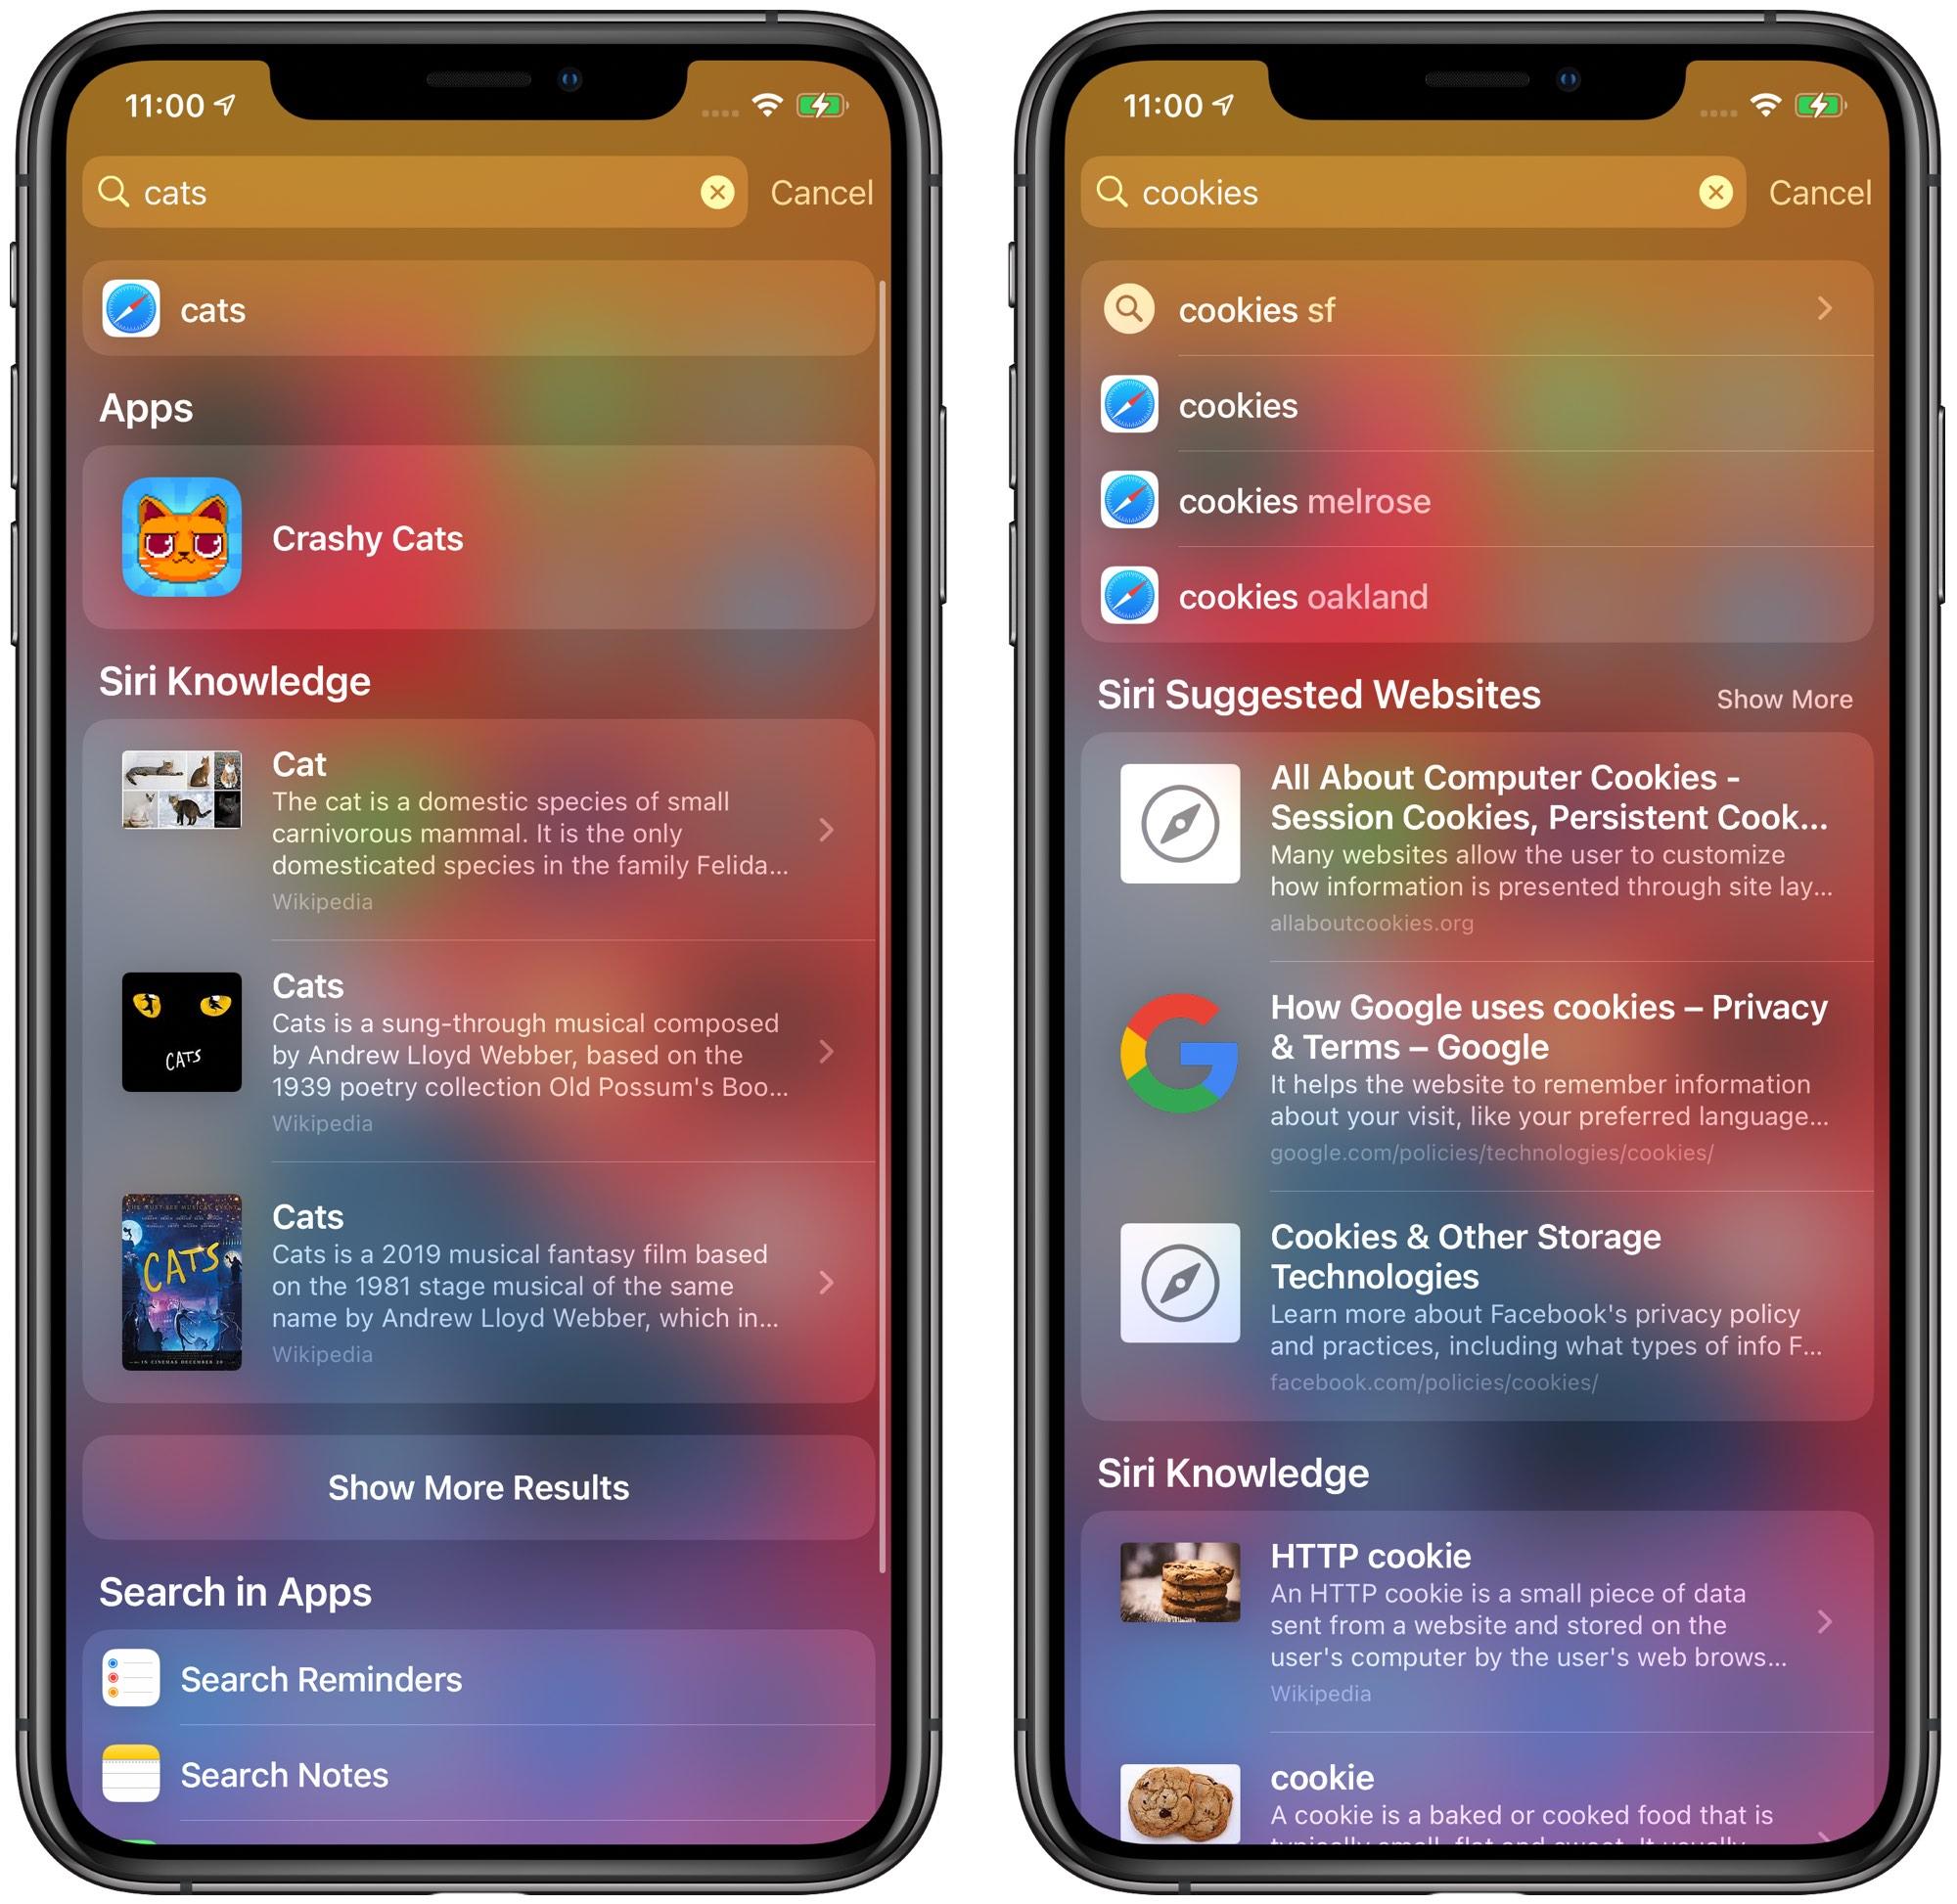 Macrumors Apple Mac Iphone Rumors And News Page 13